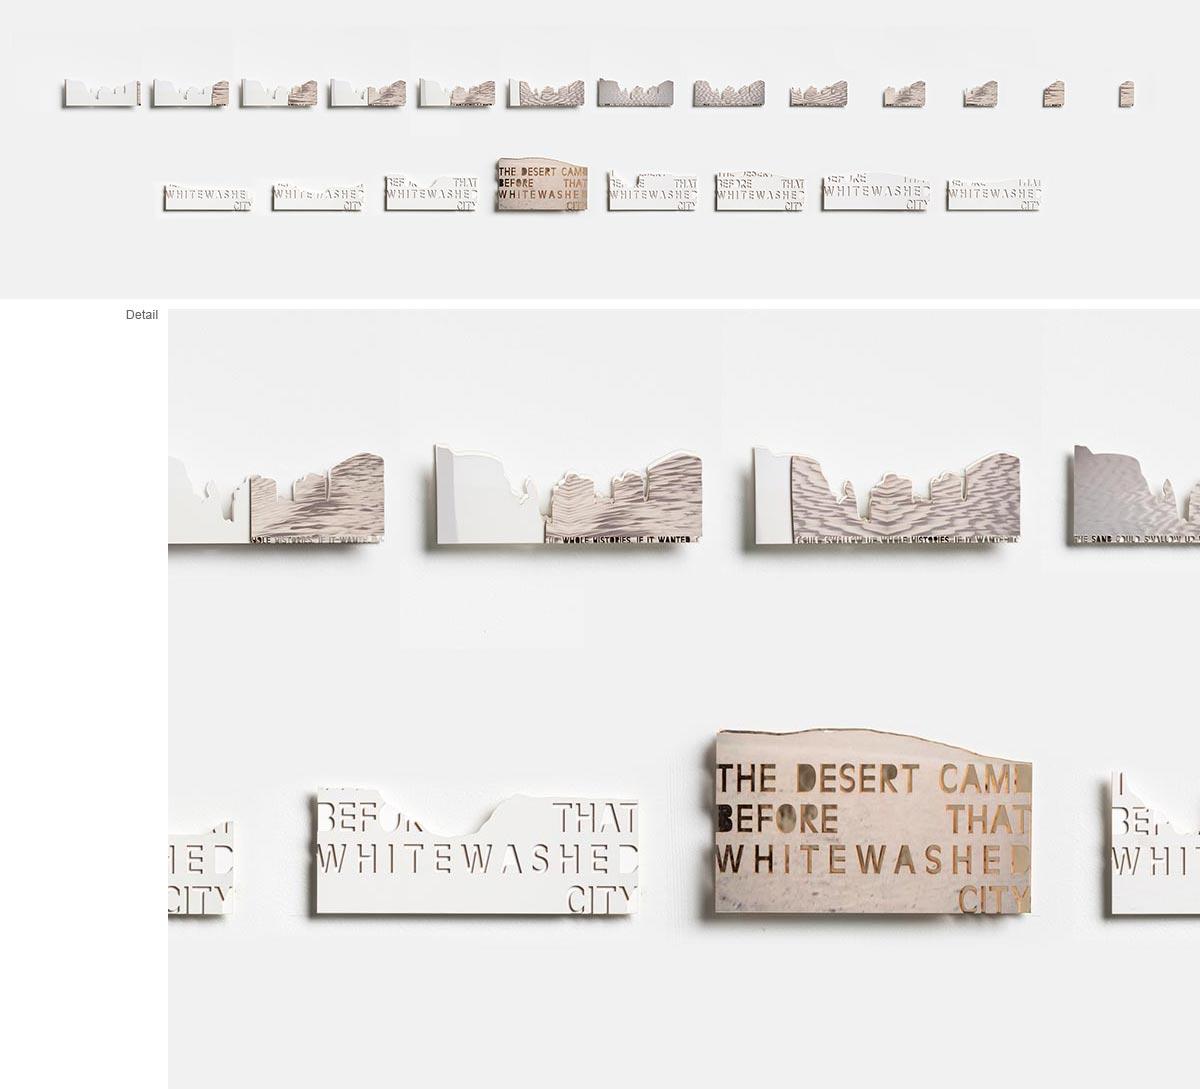 Jamie Solock - Whitewashed Cities